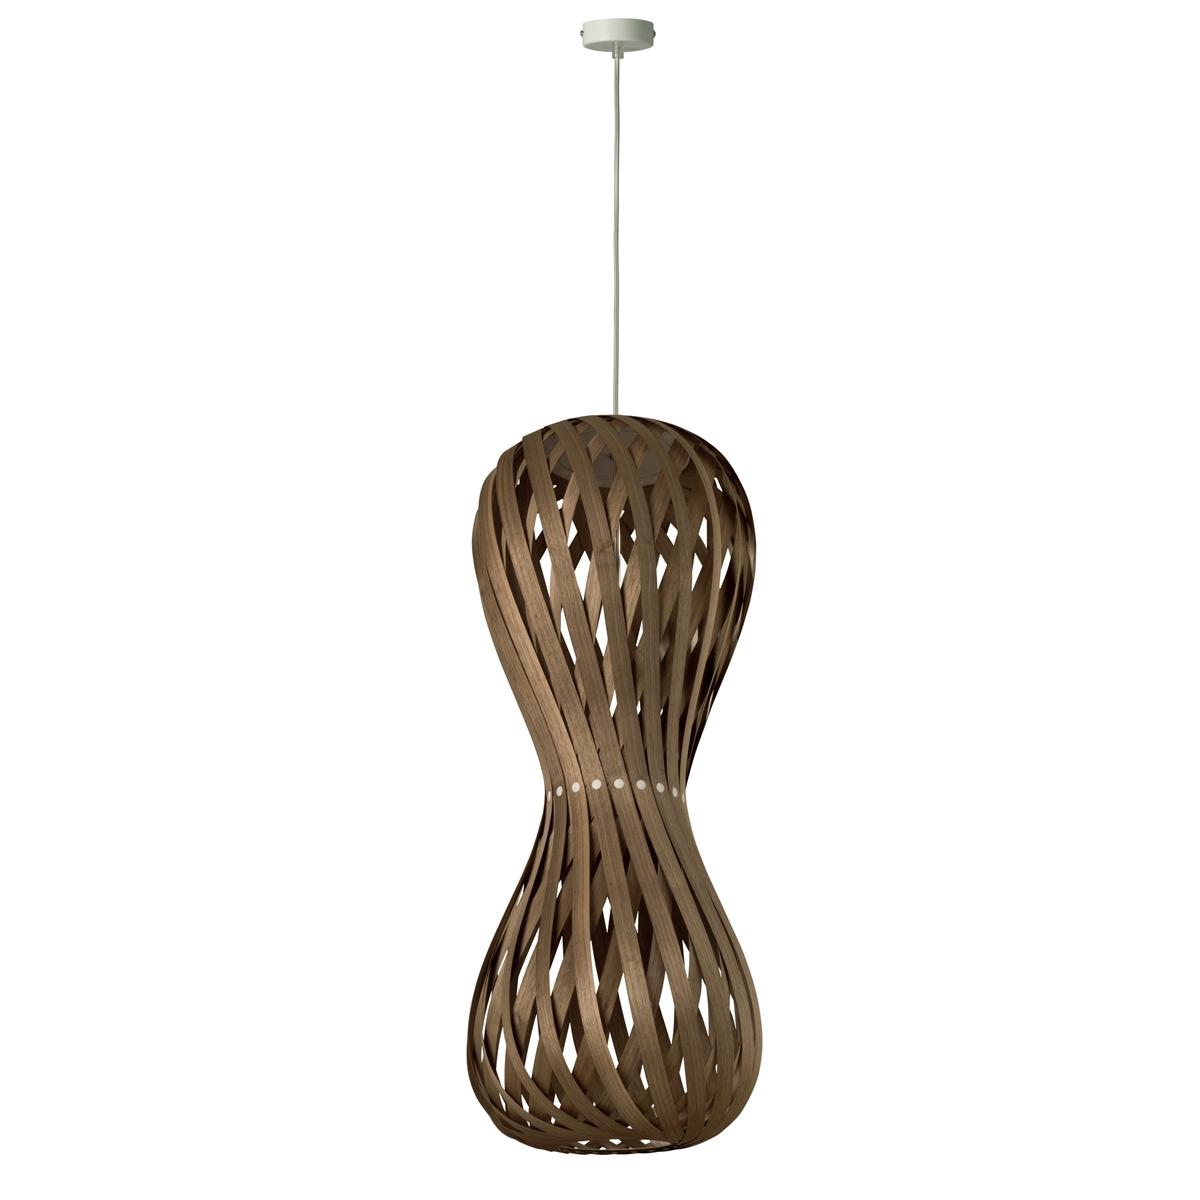 suspension contemporaine en bois en forme de sablier. Black Bedroom Furniture Sets. Home Design Ideas